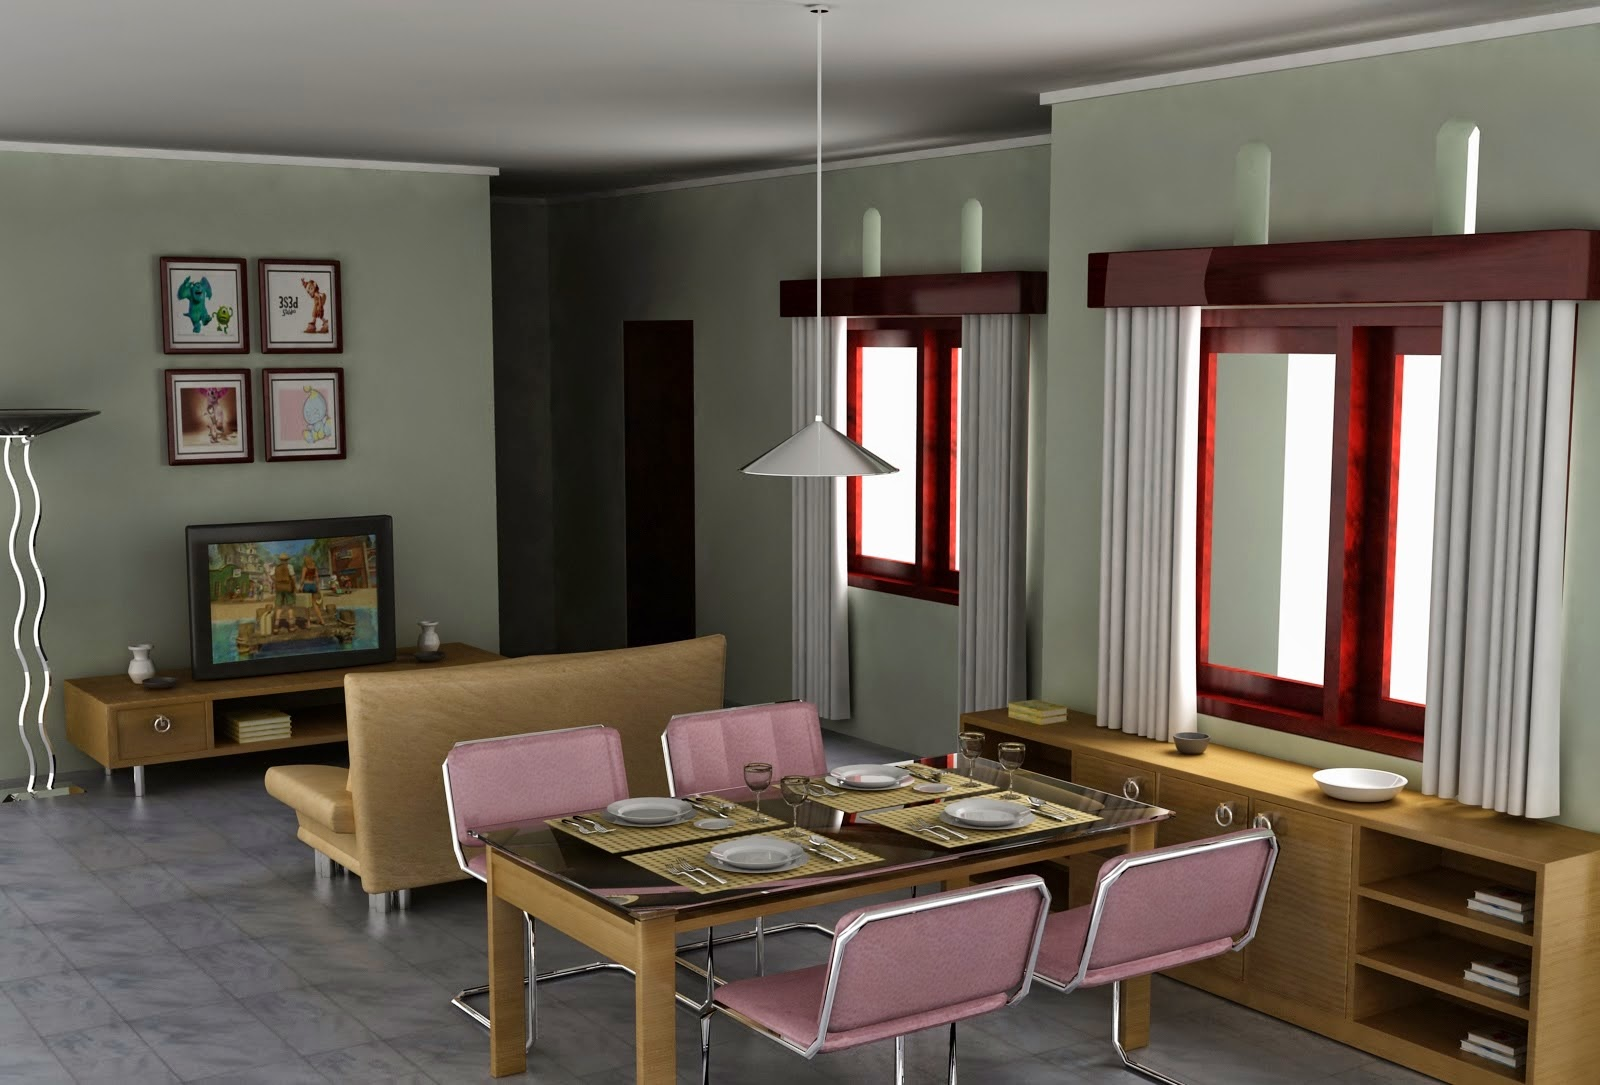 Contoh desain ruang keluarga minimalis kecil sederhana